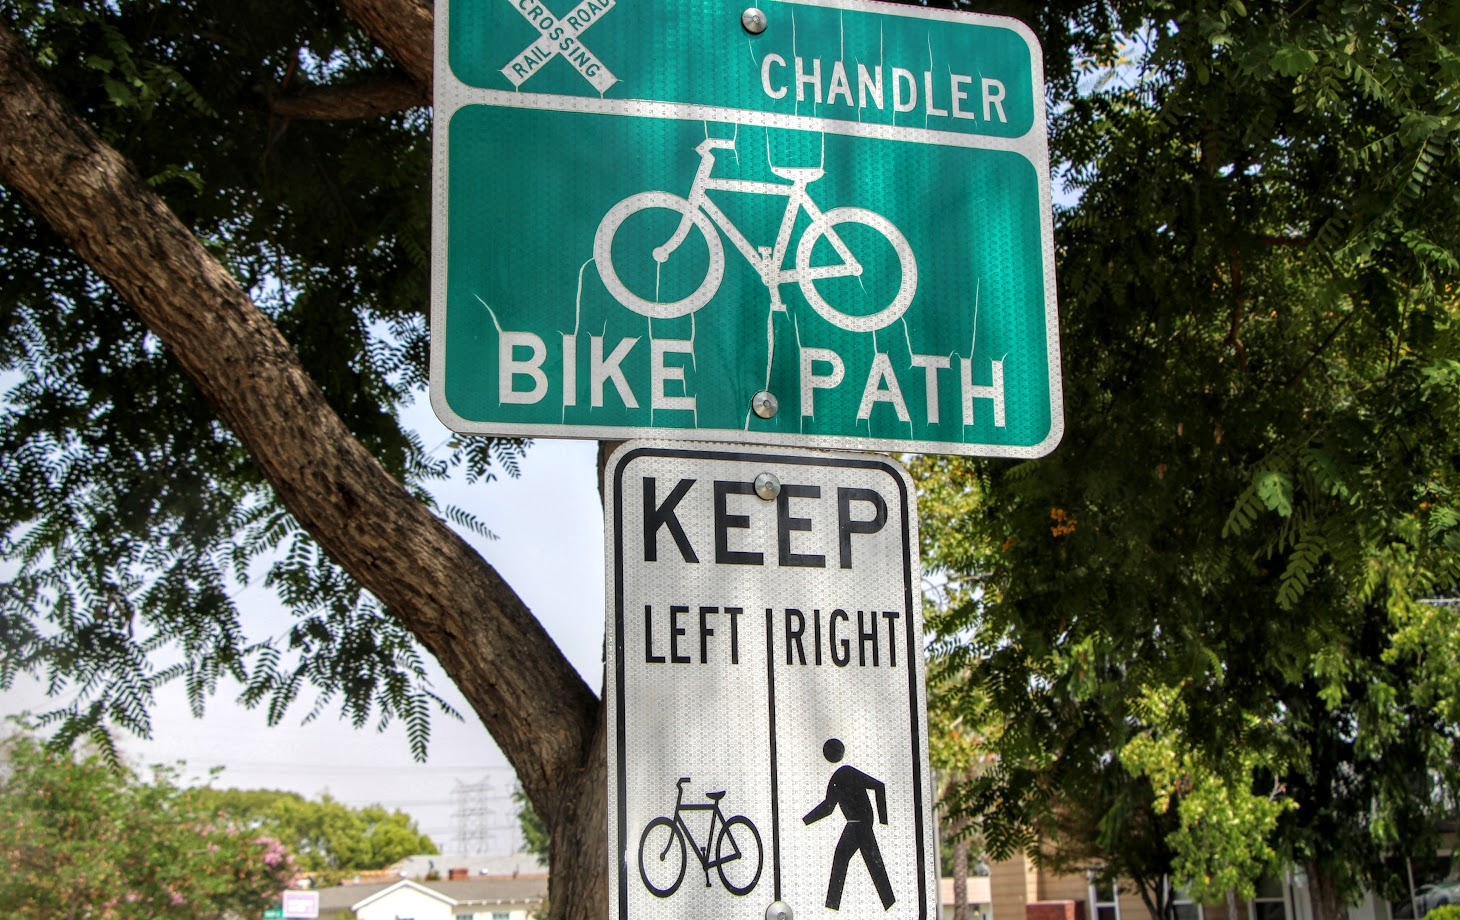 chandler-bike-path-5